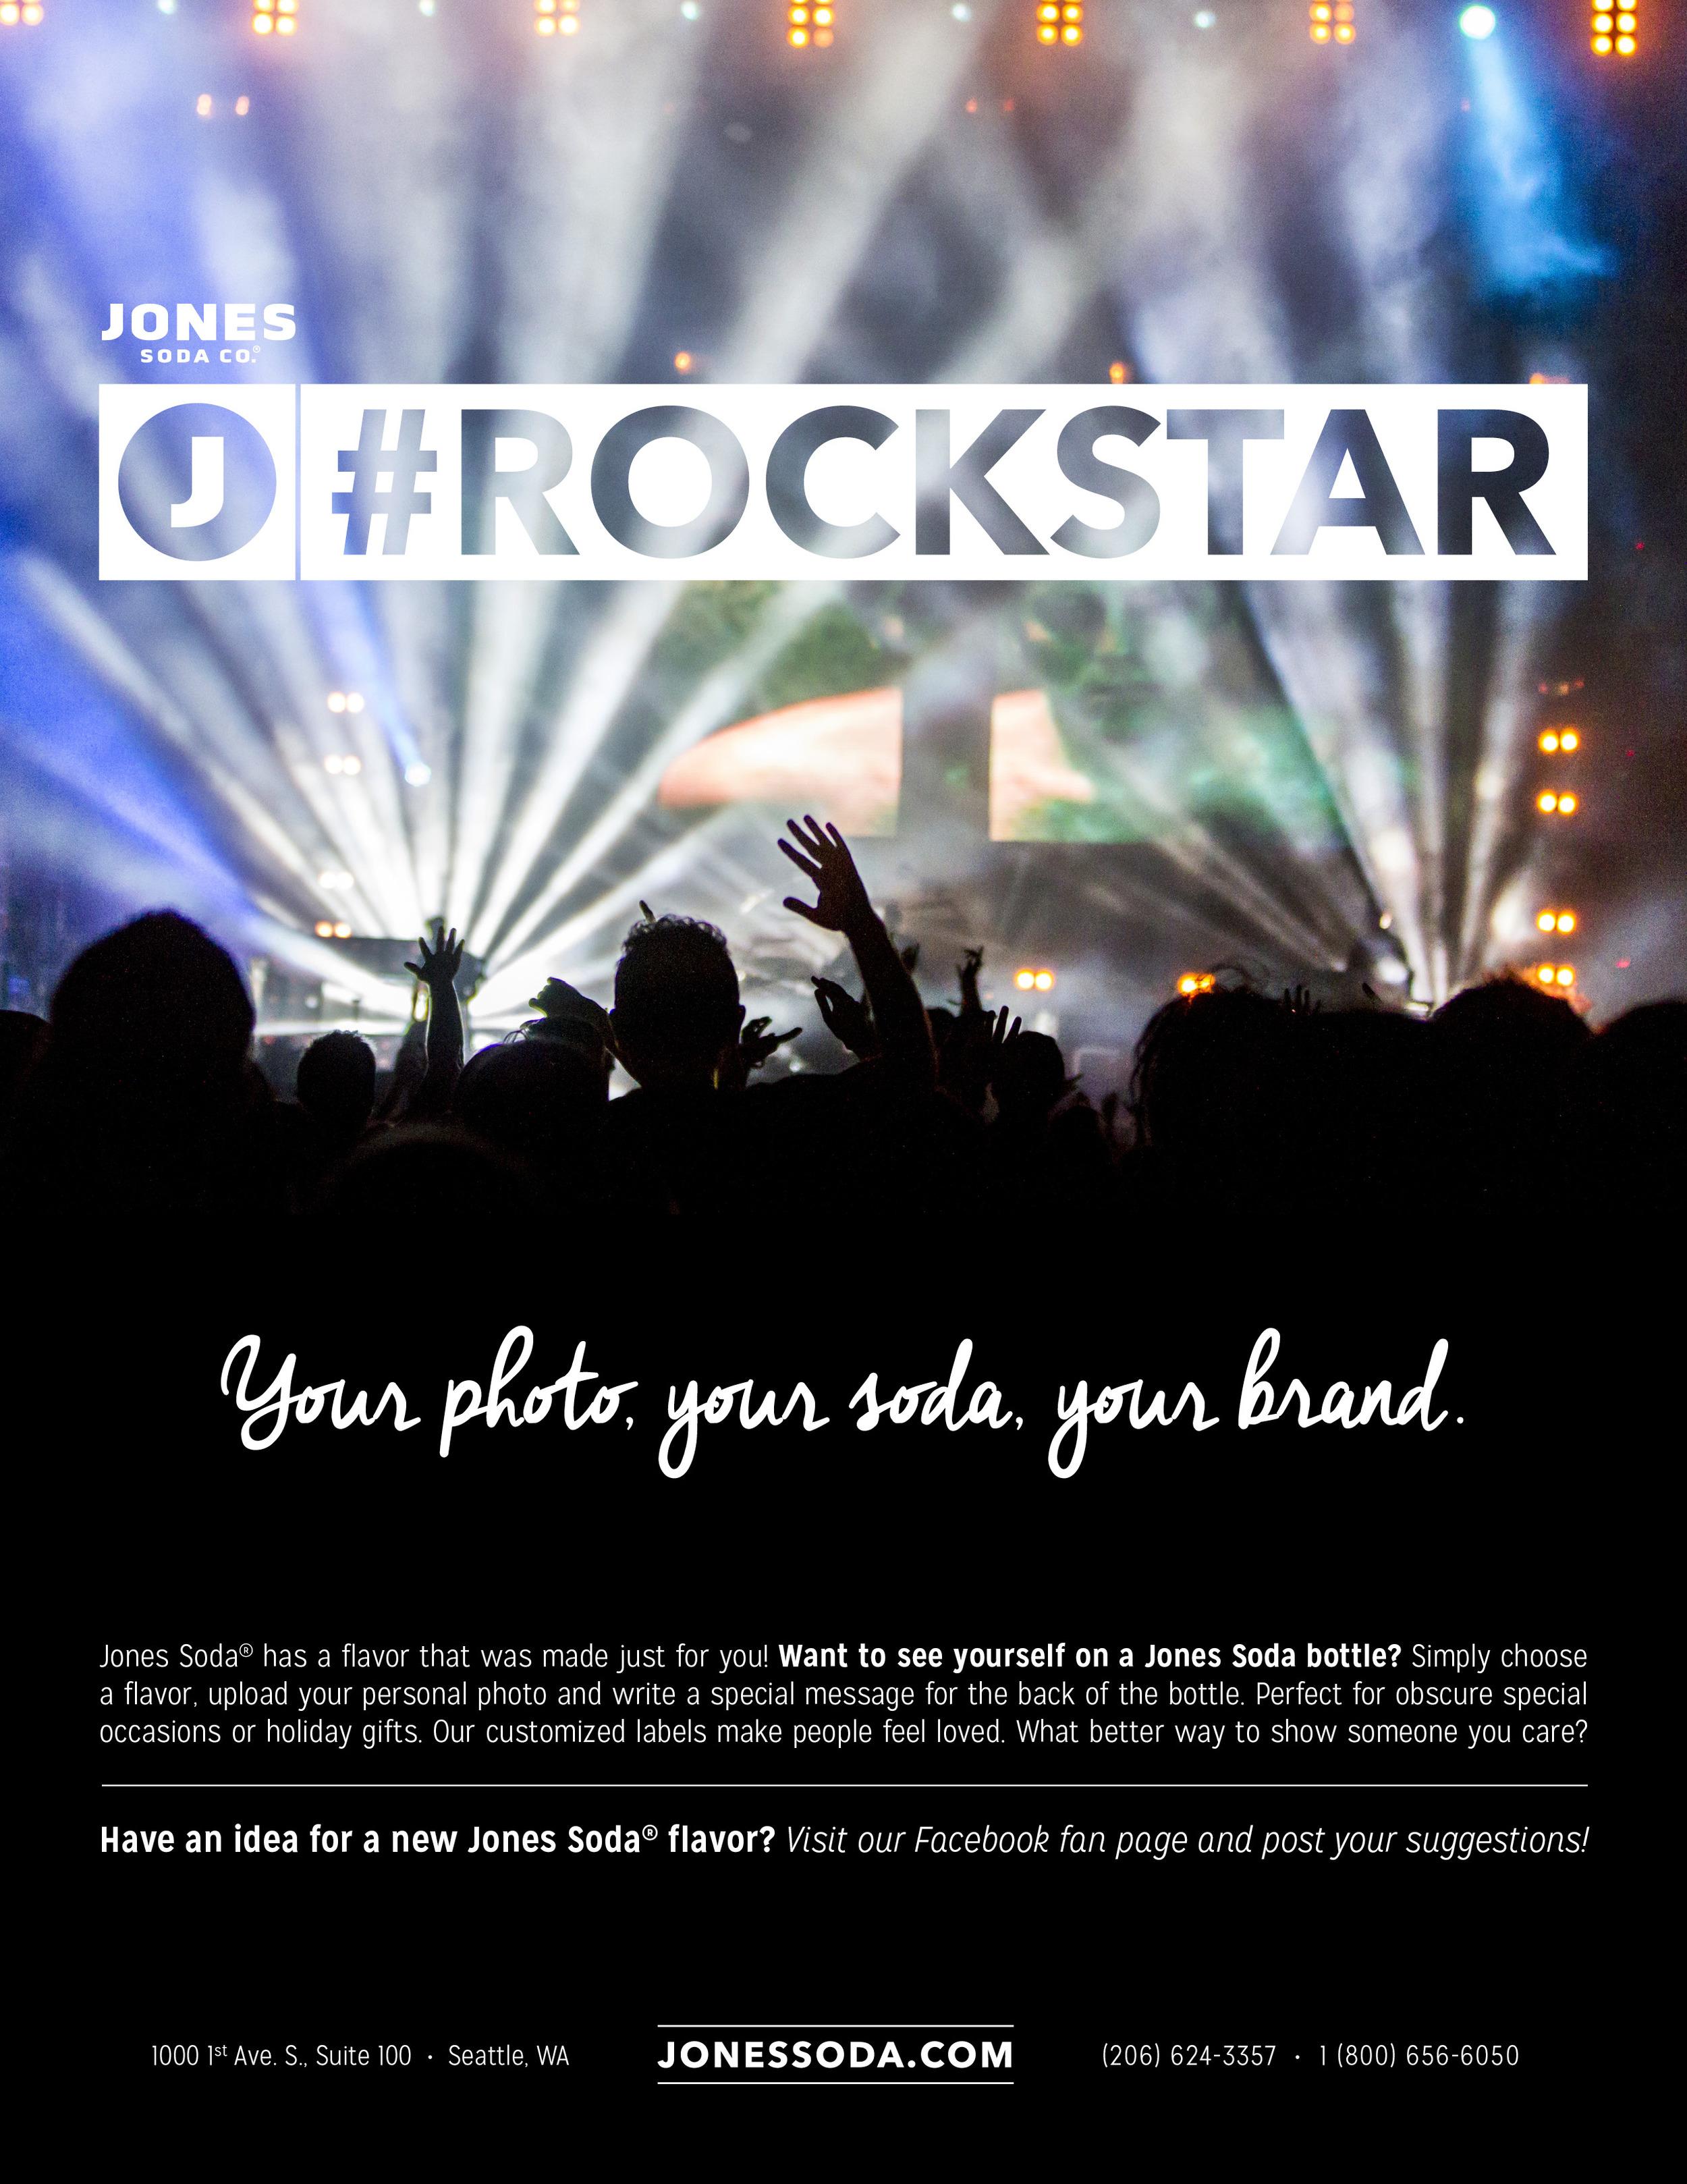 Jones_Magazine Ad_Rockstar_web.jpg